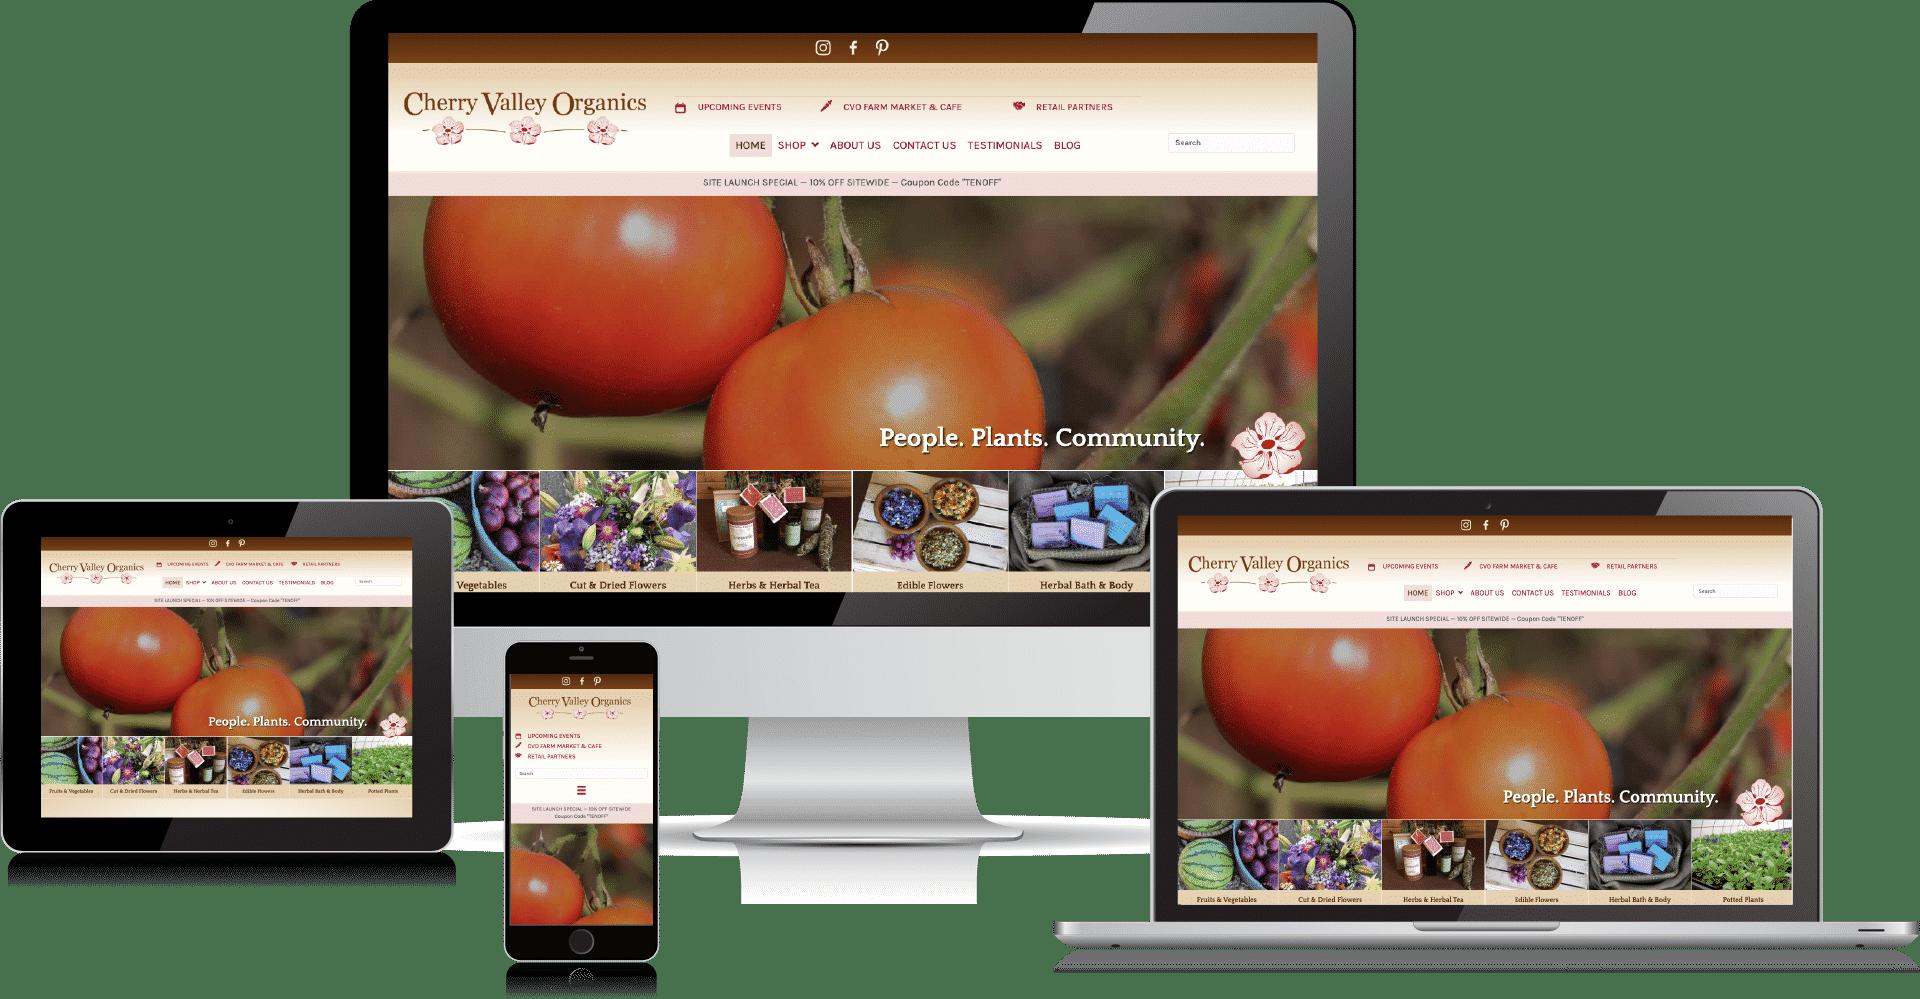 Cherry Valley Organics website by 50 Marketing